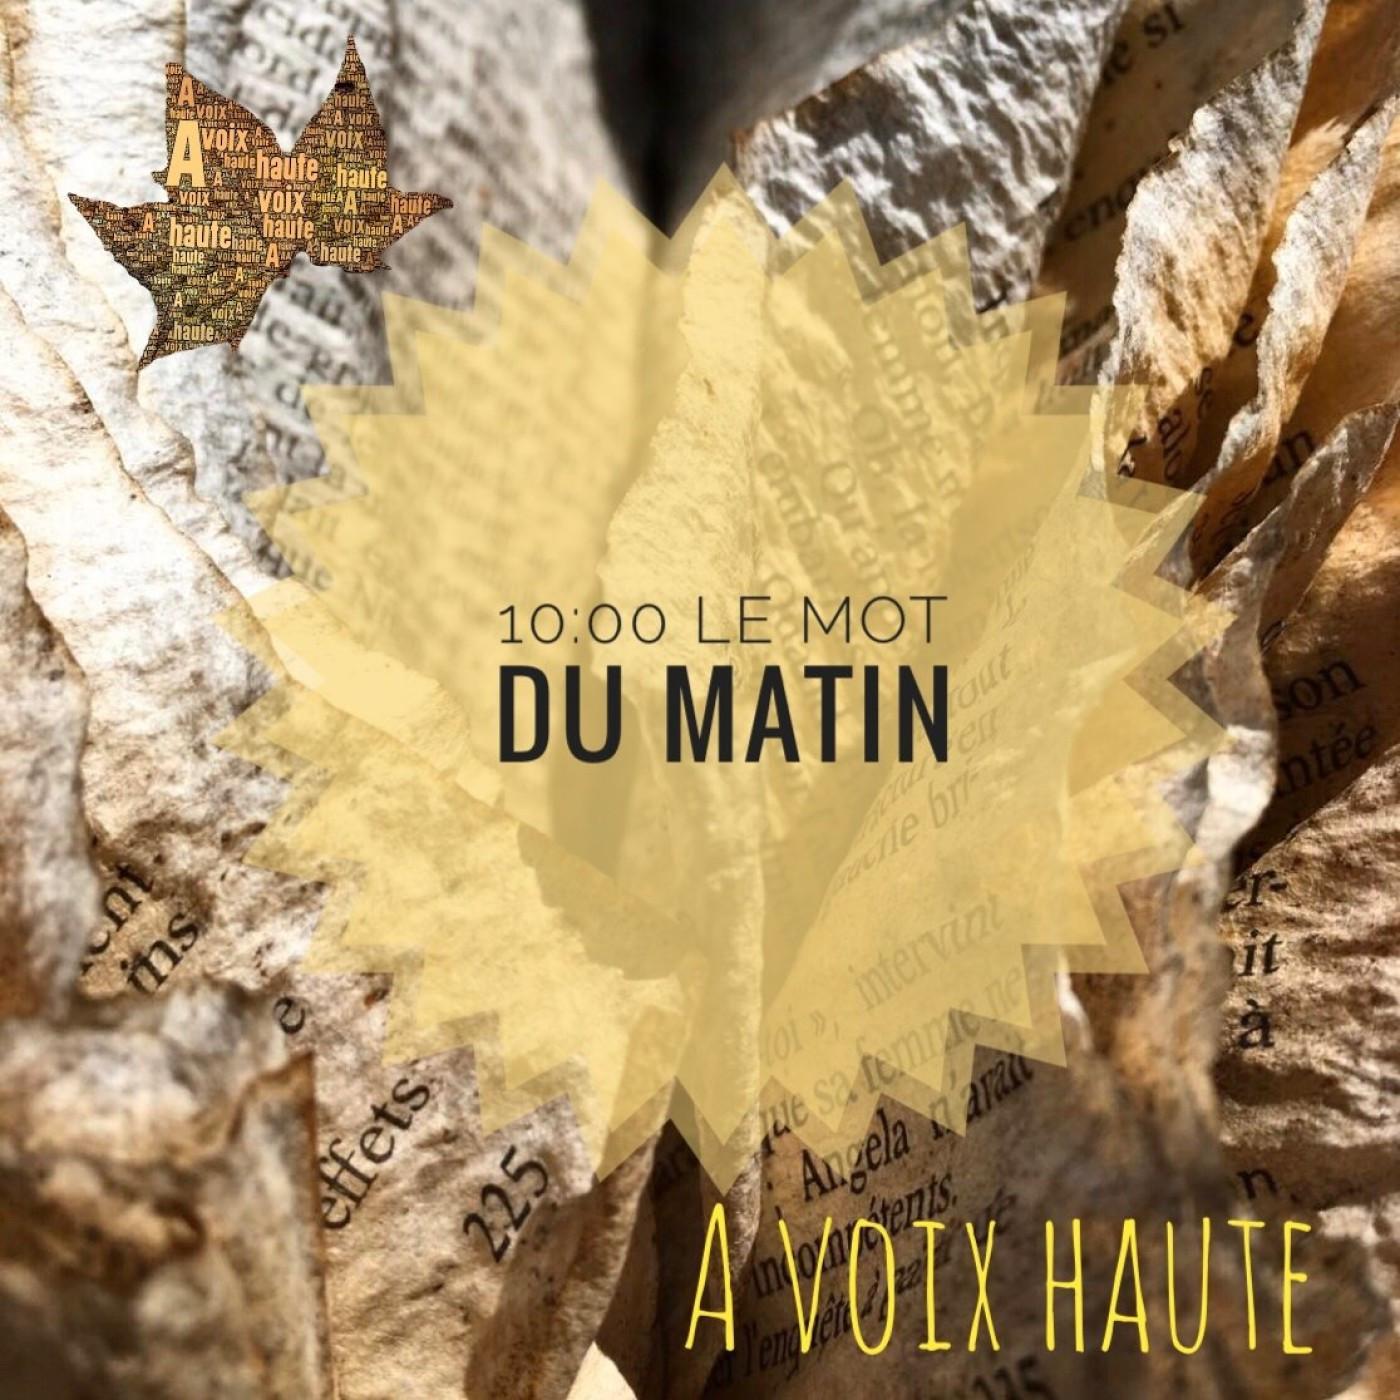 28 - LE MOT DU MATIN - Francoise Sagan - Yannick Debain.